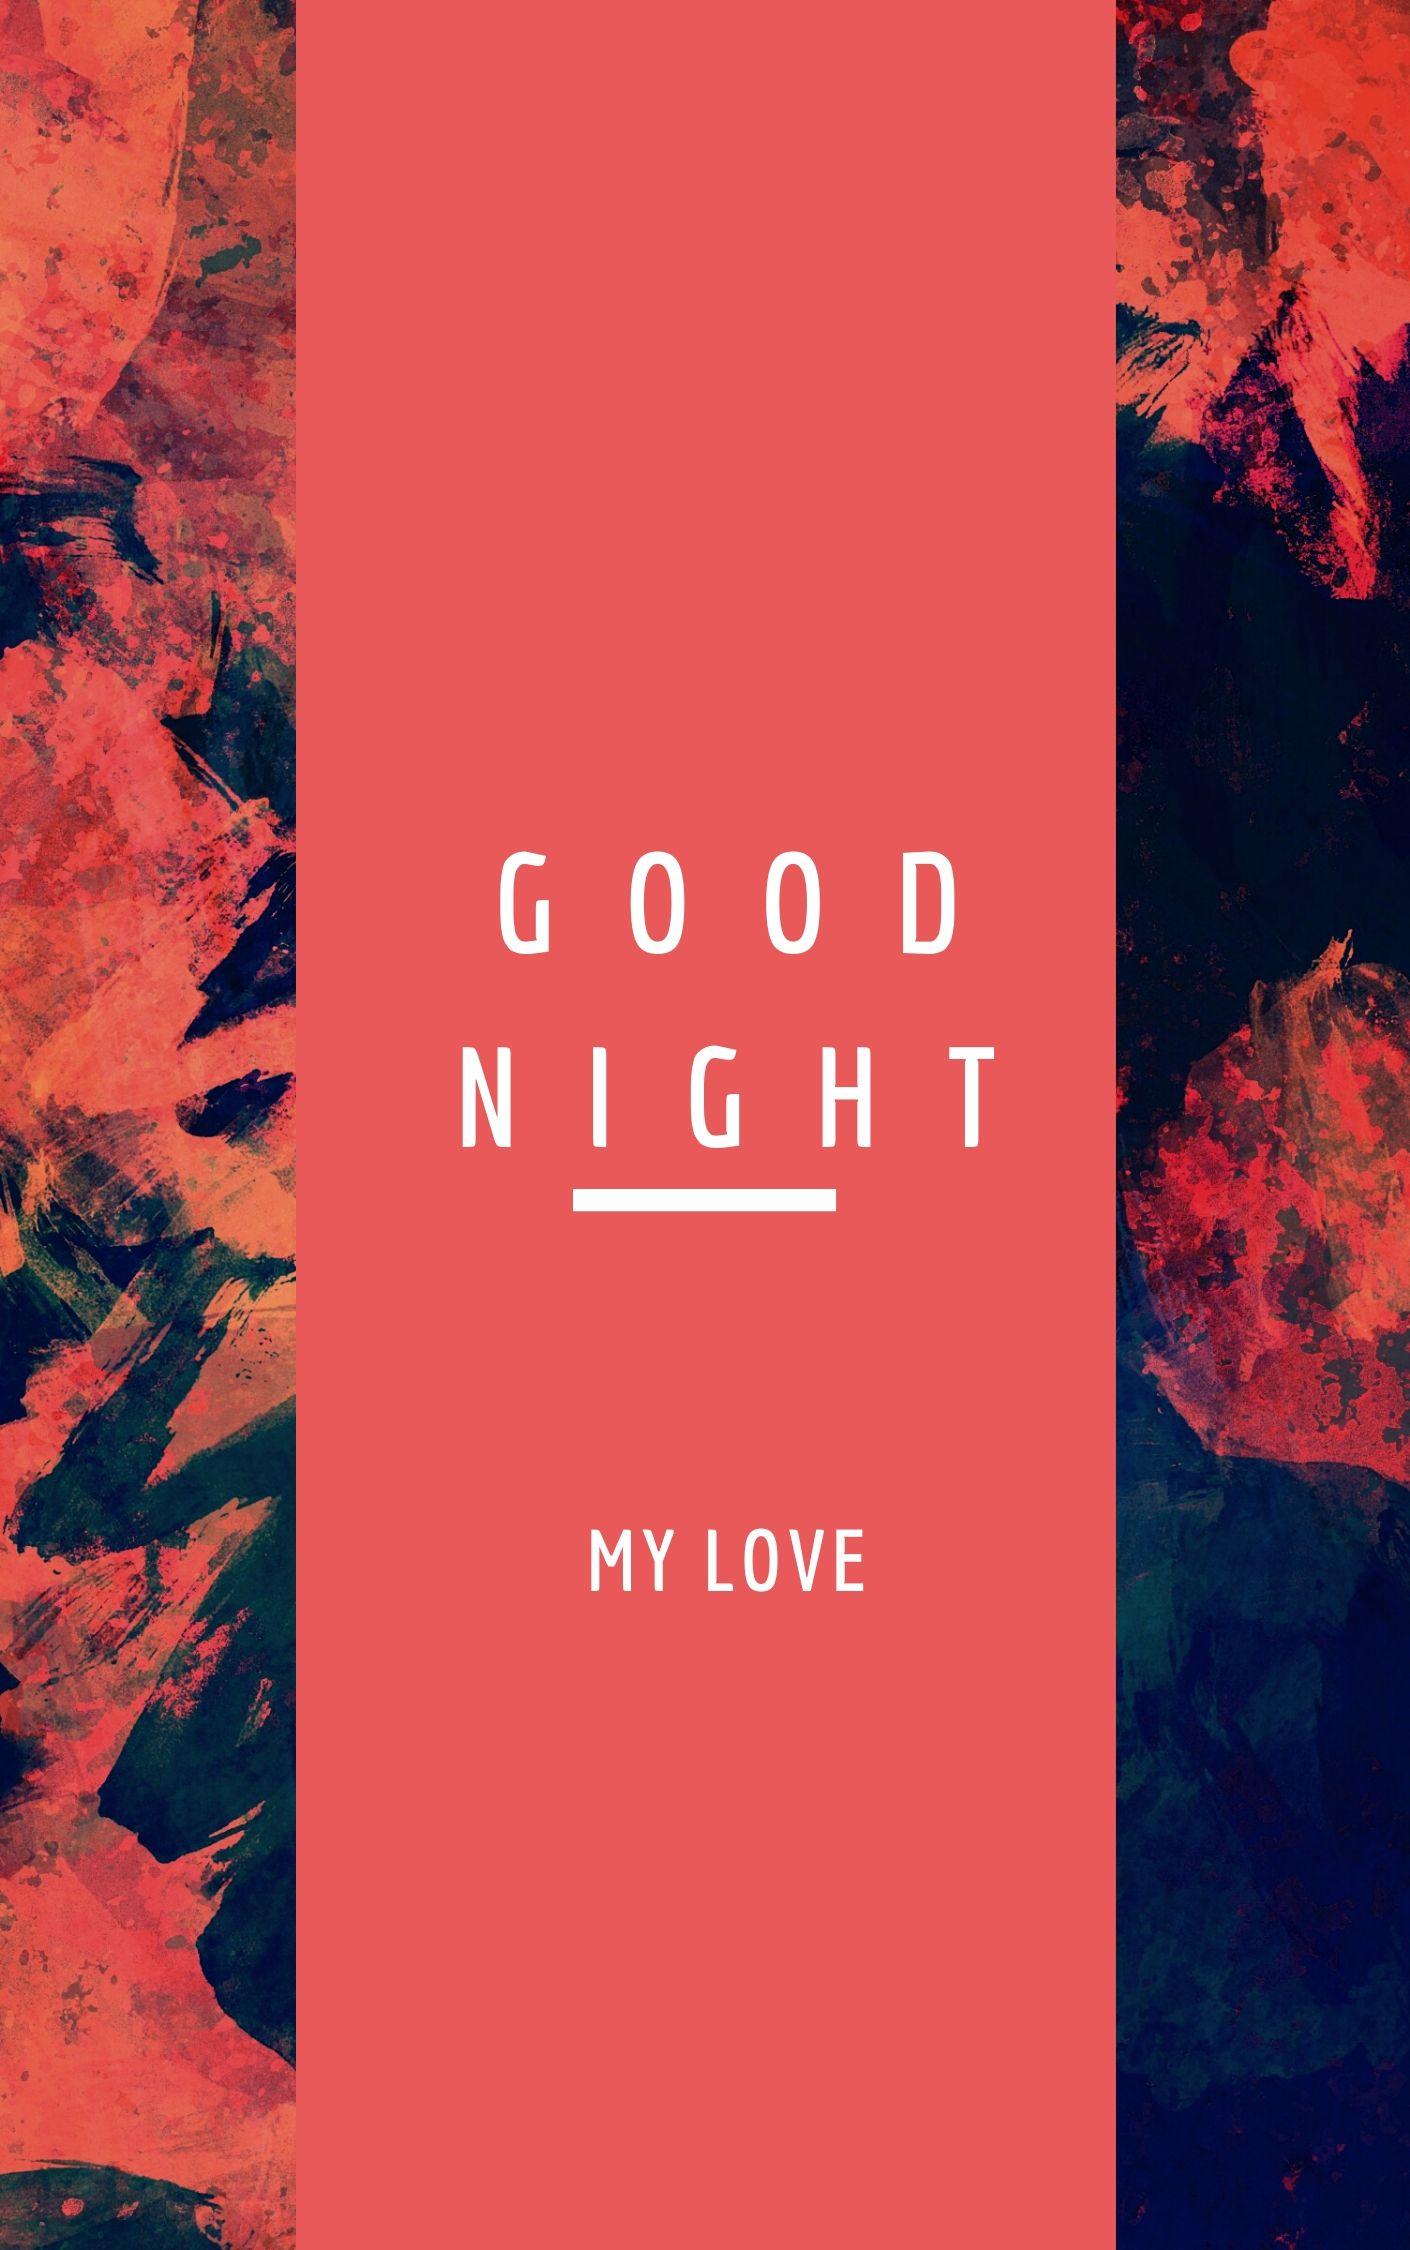 Good Night My Love Image hd full HD free download.